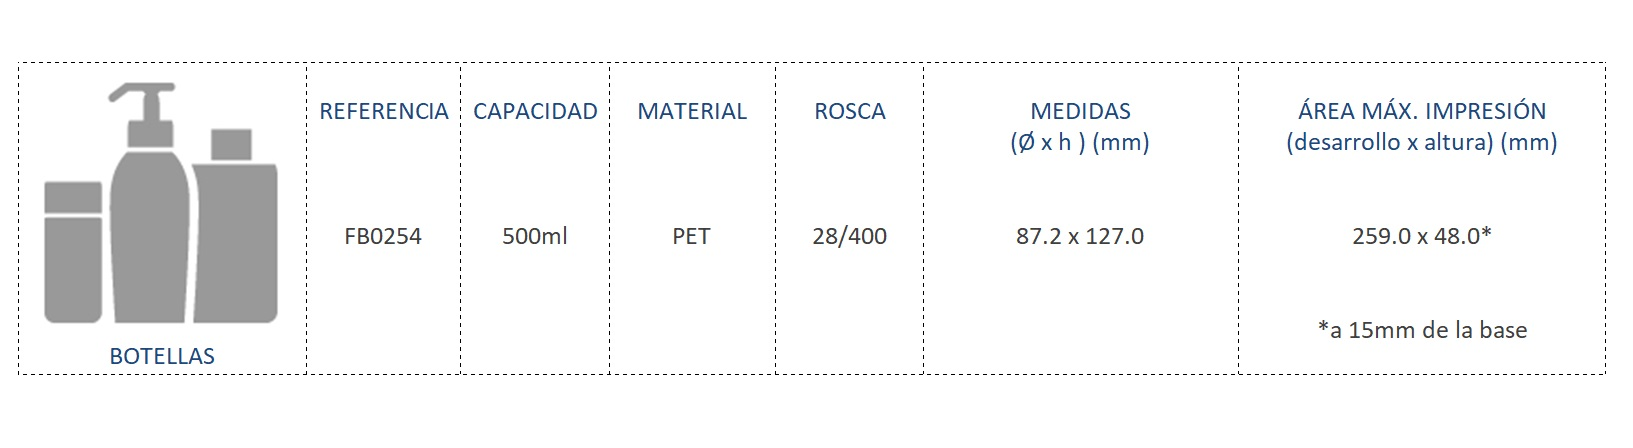 Cuadro de materiales FB0254